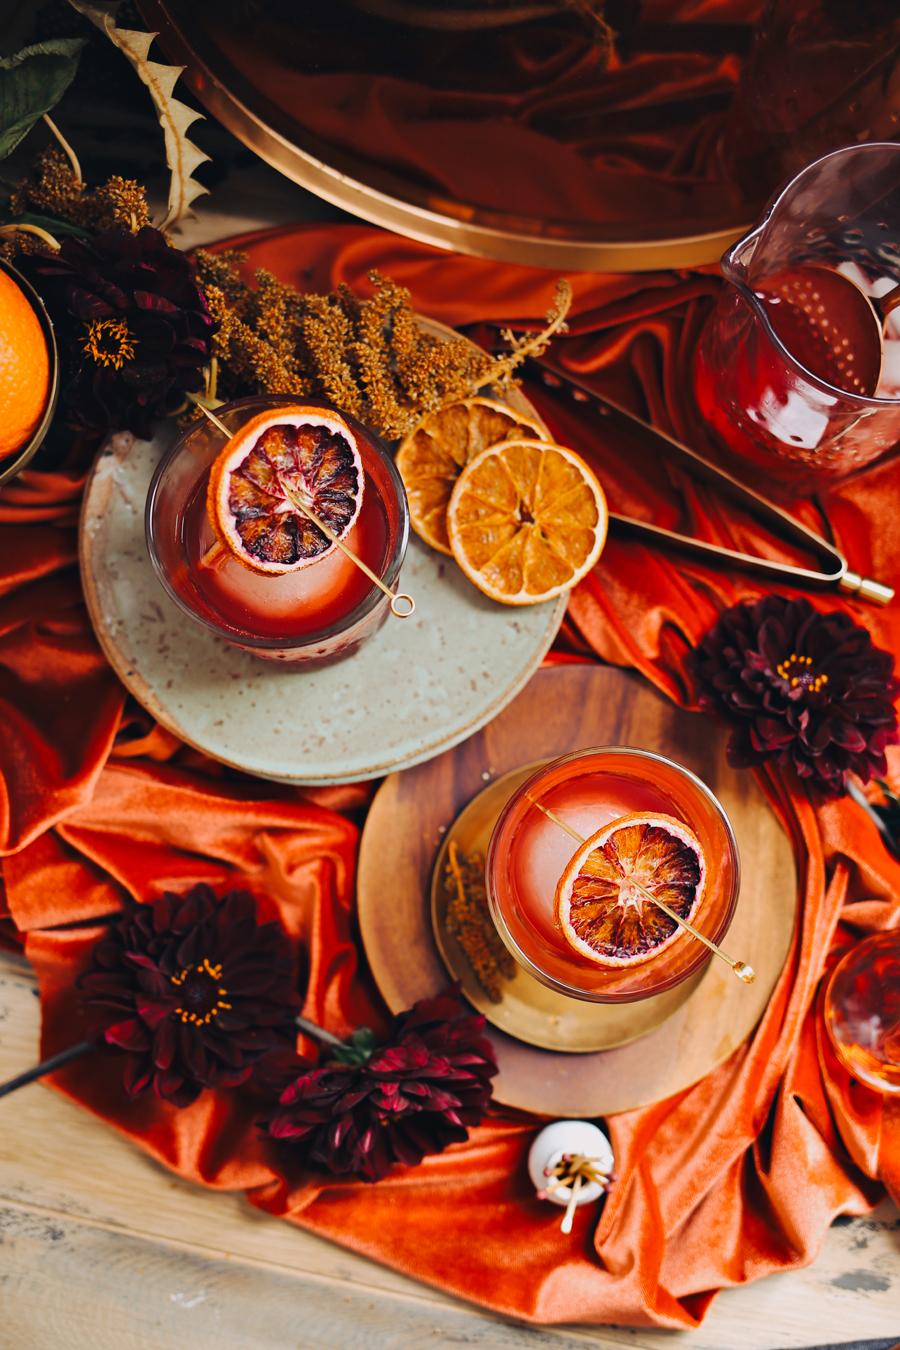 06_Smoked-Blood-Orange-Boulevardier-Dine-X-Design.jpg